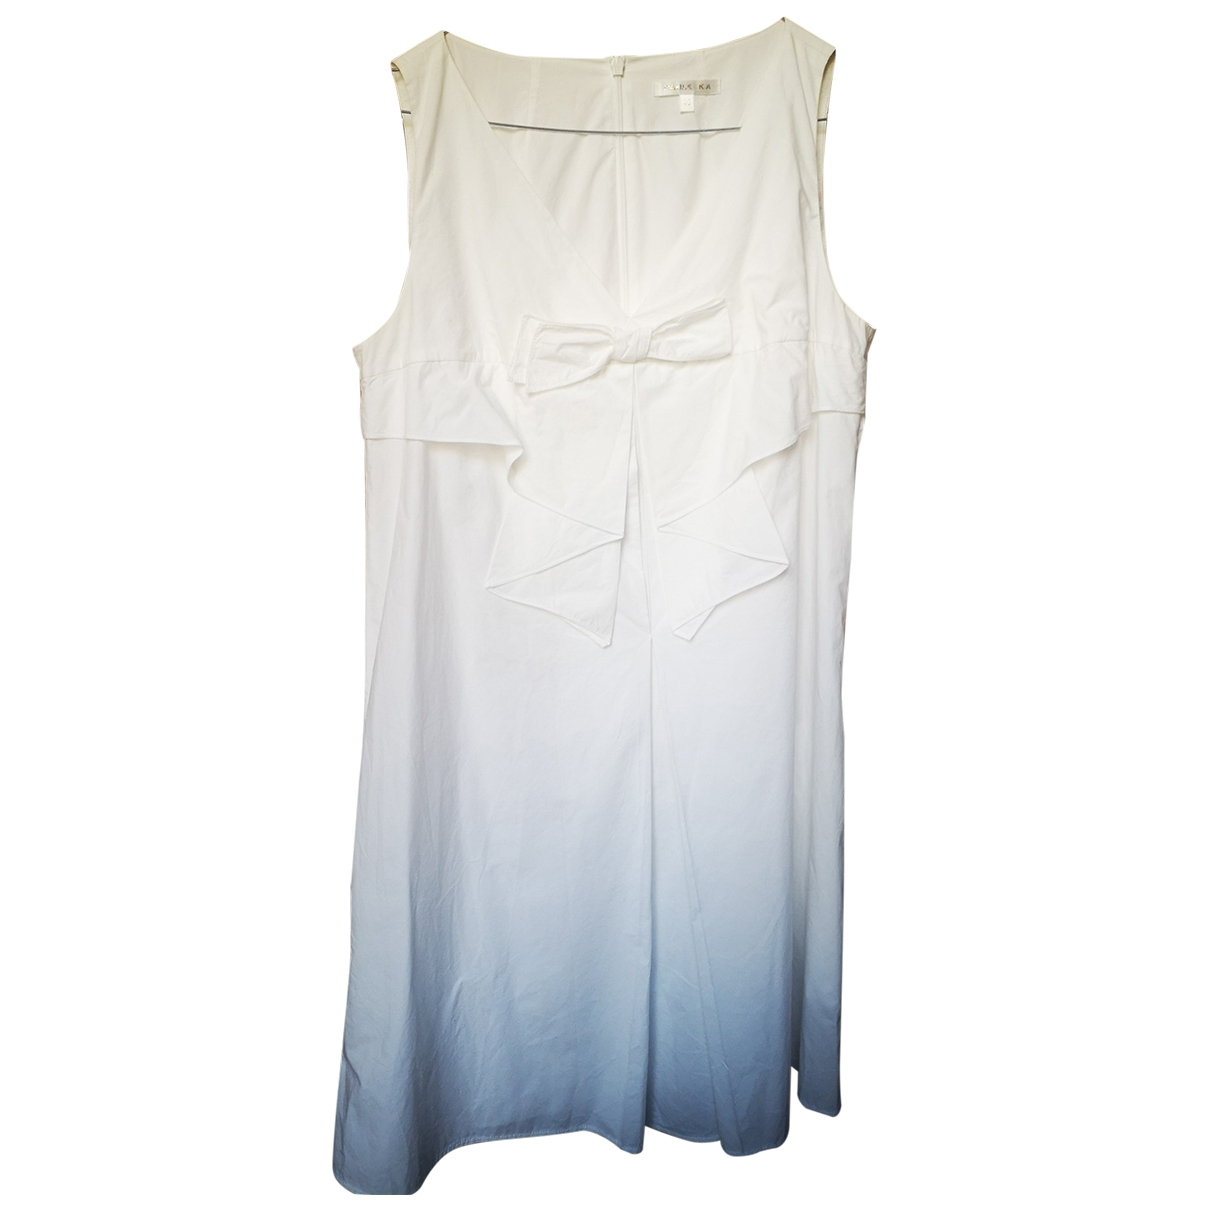 Paule Ka \N White Cotton dress for Women 40 FR